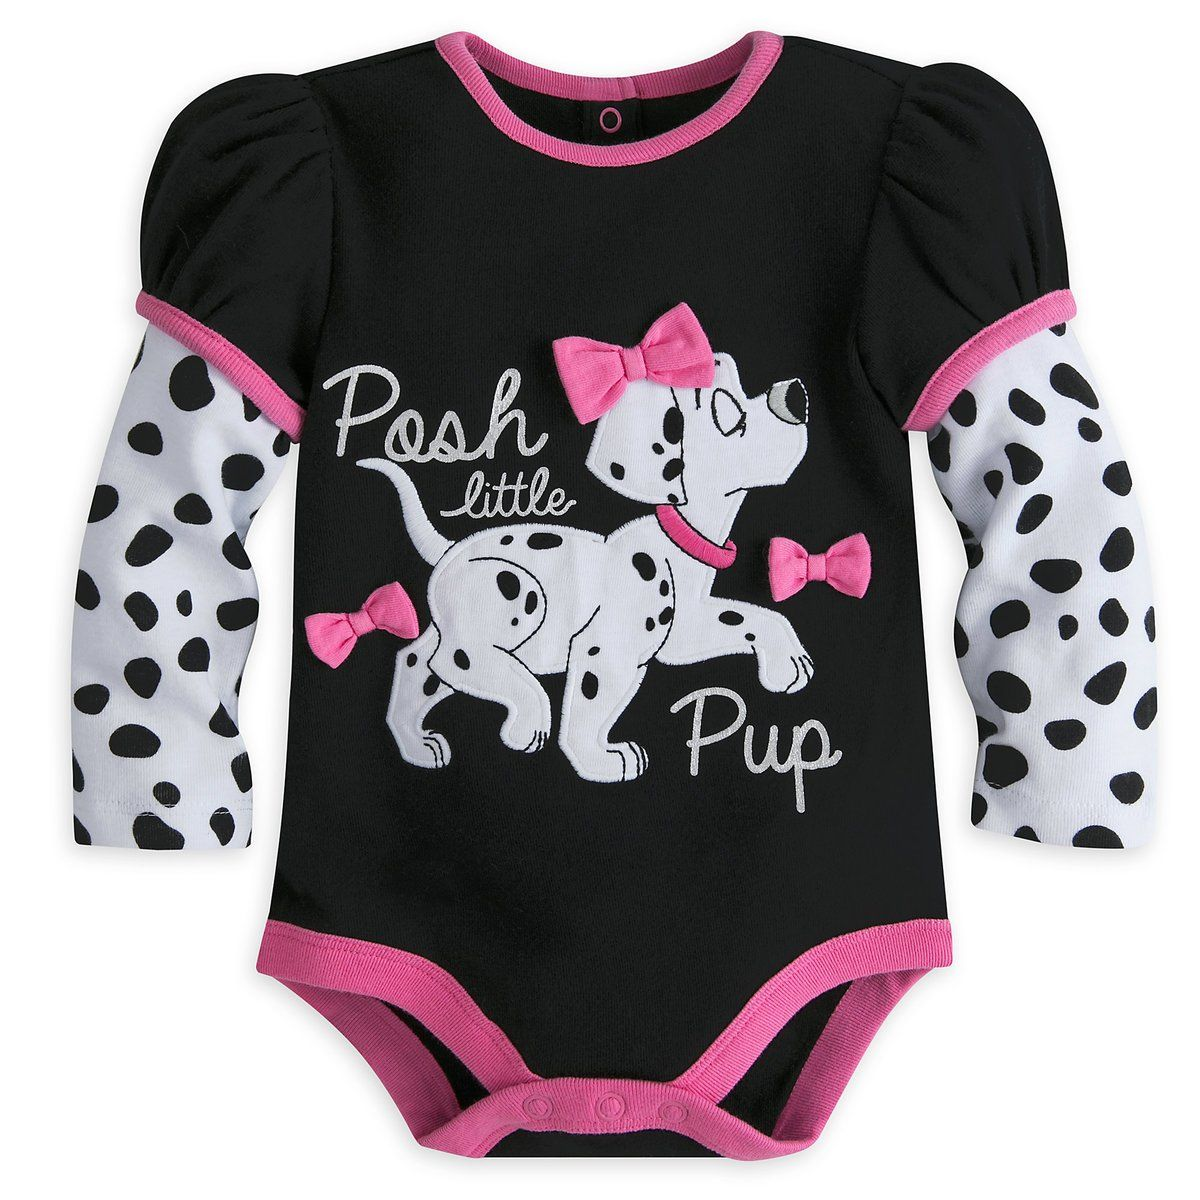 Disney Store 101 Dalmatians Baby Girls Bodysuit 1824 Baby Girl Clothing Baby Girl Fashion In 2020 Disney Baby Clothes Girl Disney Baby Clothes Baby Girl Bodysuit